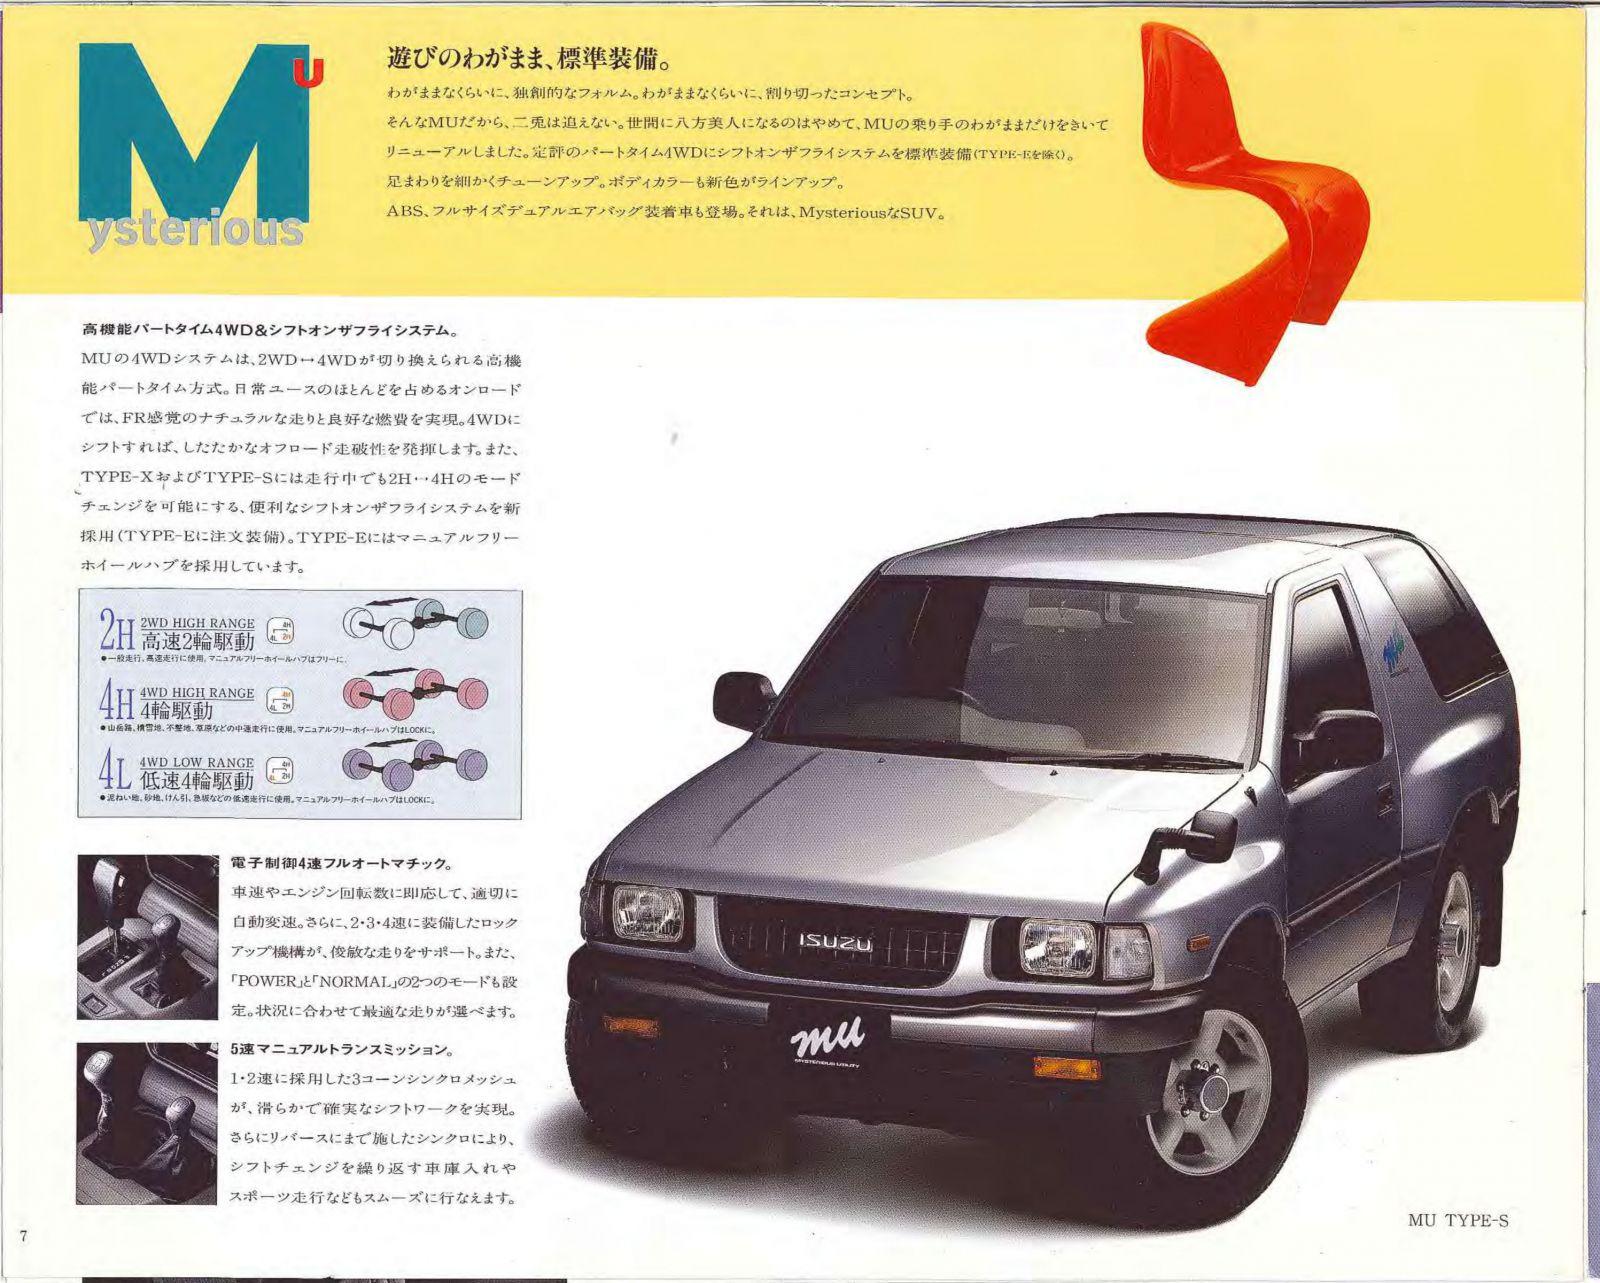 Isuzu Mu Wizard 1995_Page8.jpg